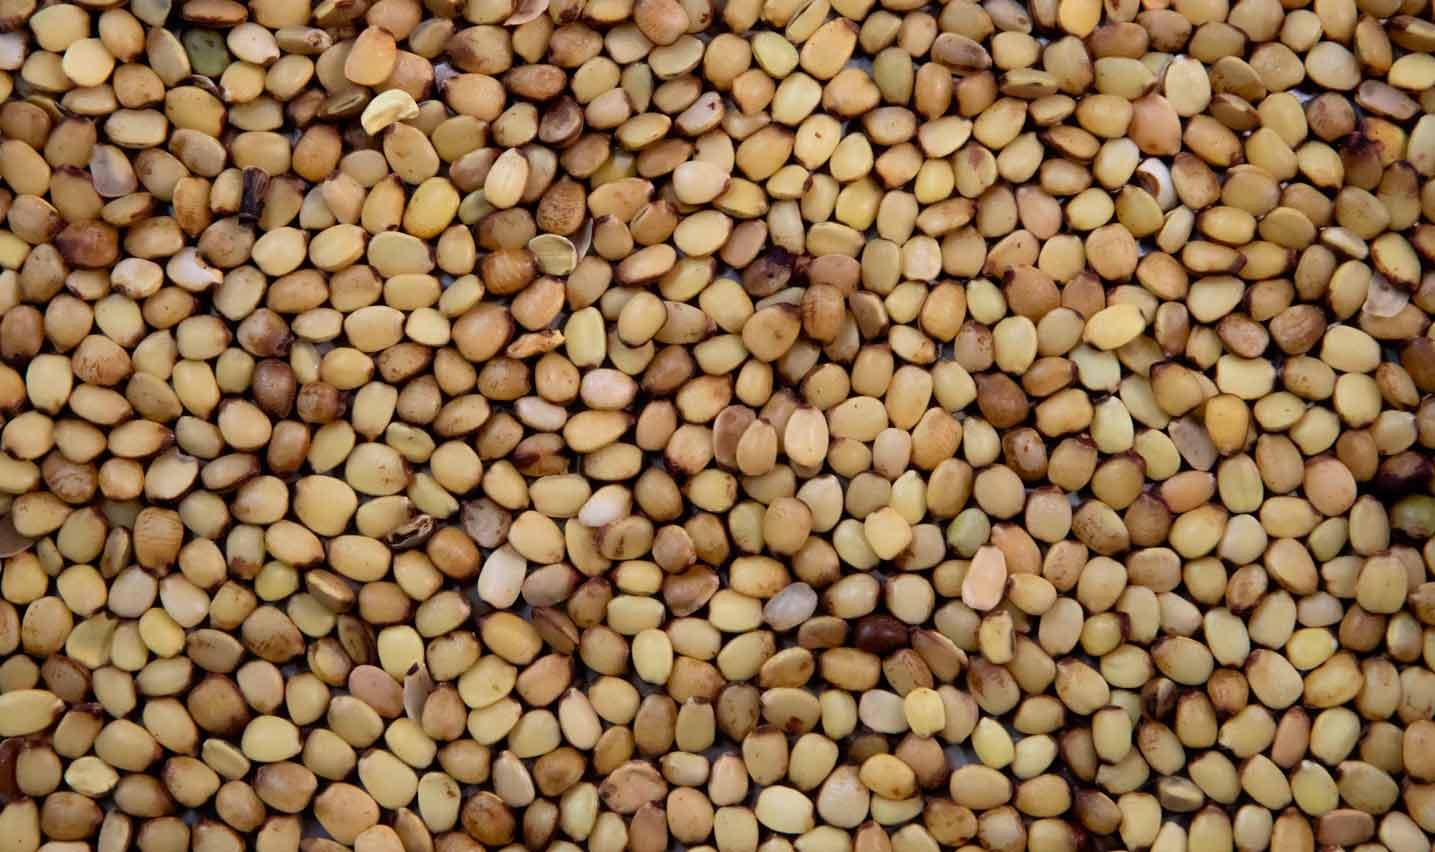 Semillas del algarrobo